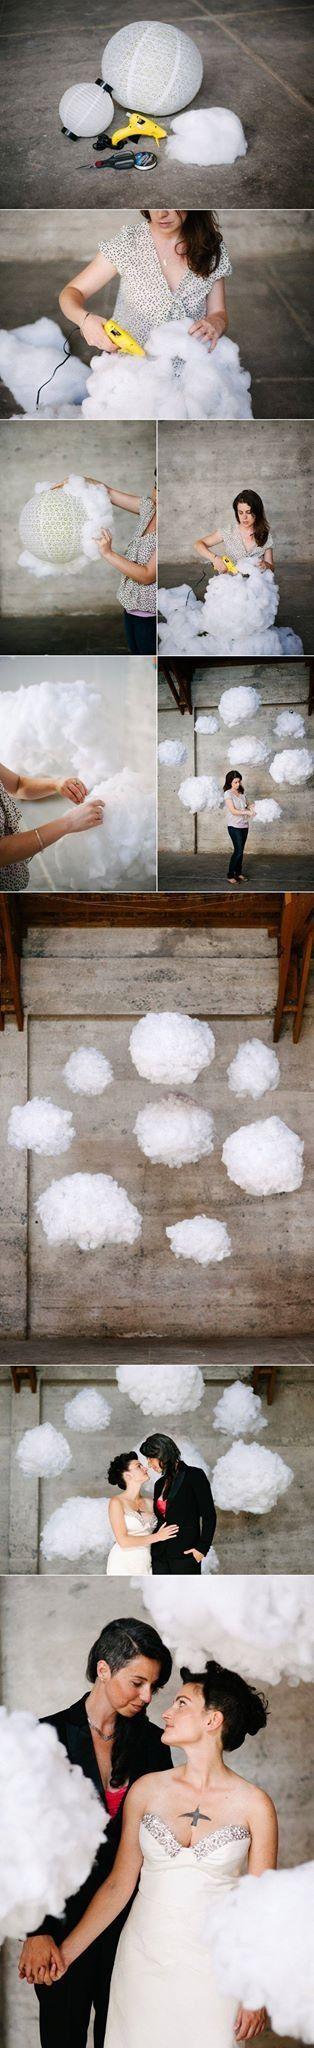 nube de algodon